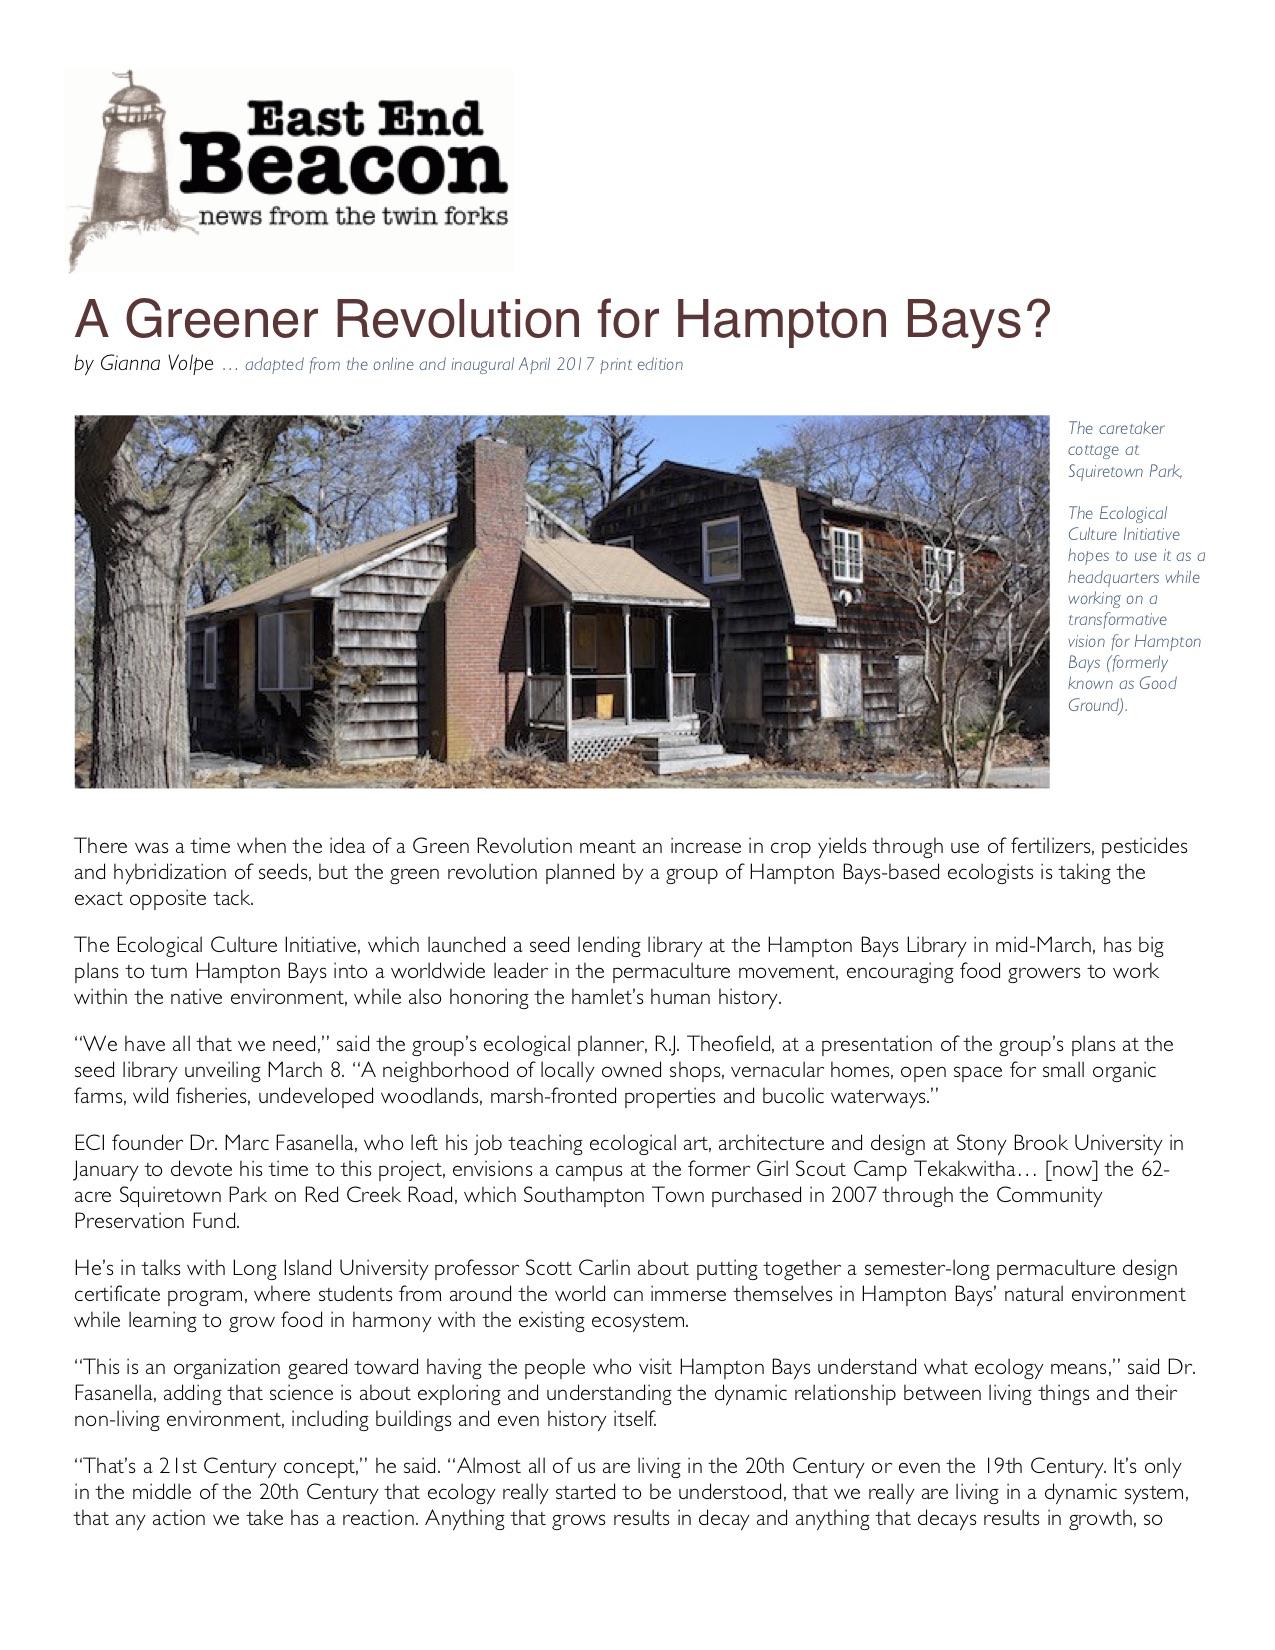 A Greener Revolution for Hampton Bays copy 2.jpg